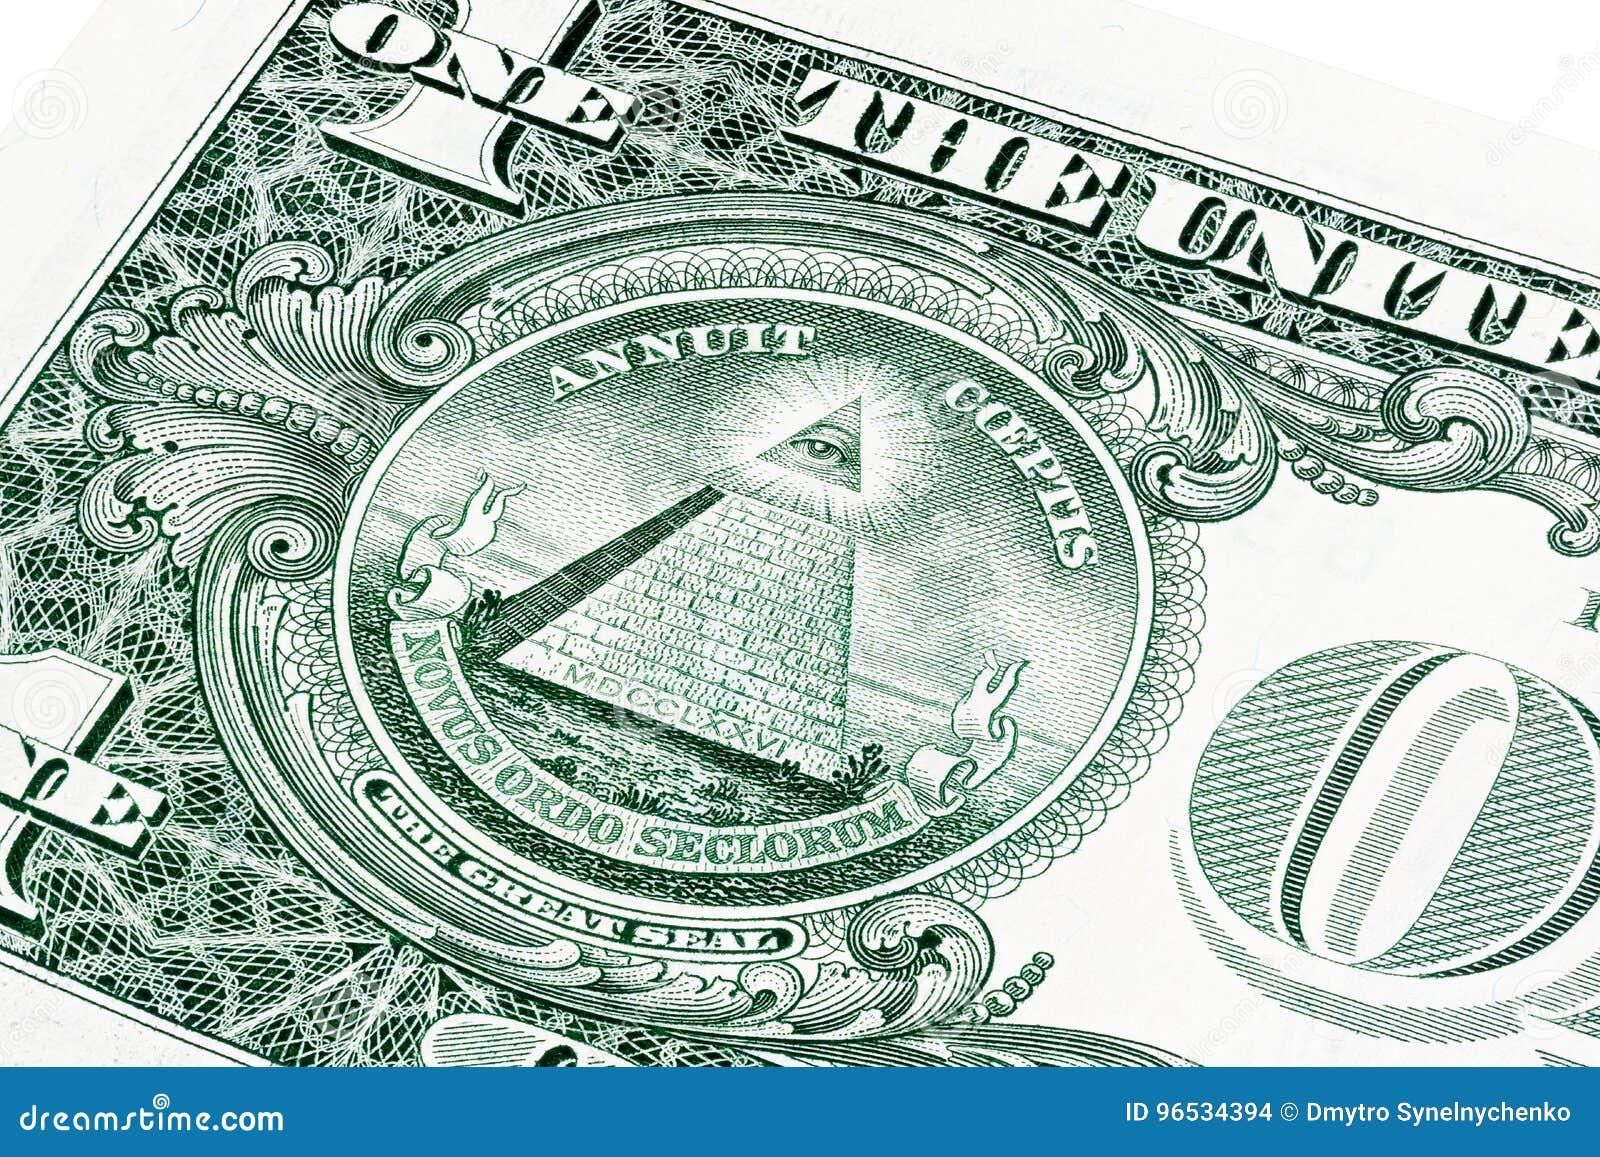 Illuminati Stock Photos Royalty Free Stock Images